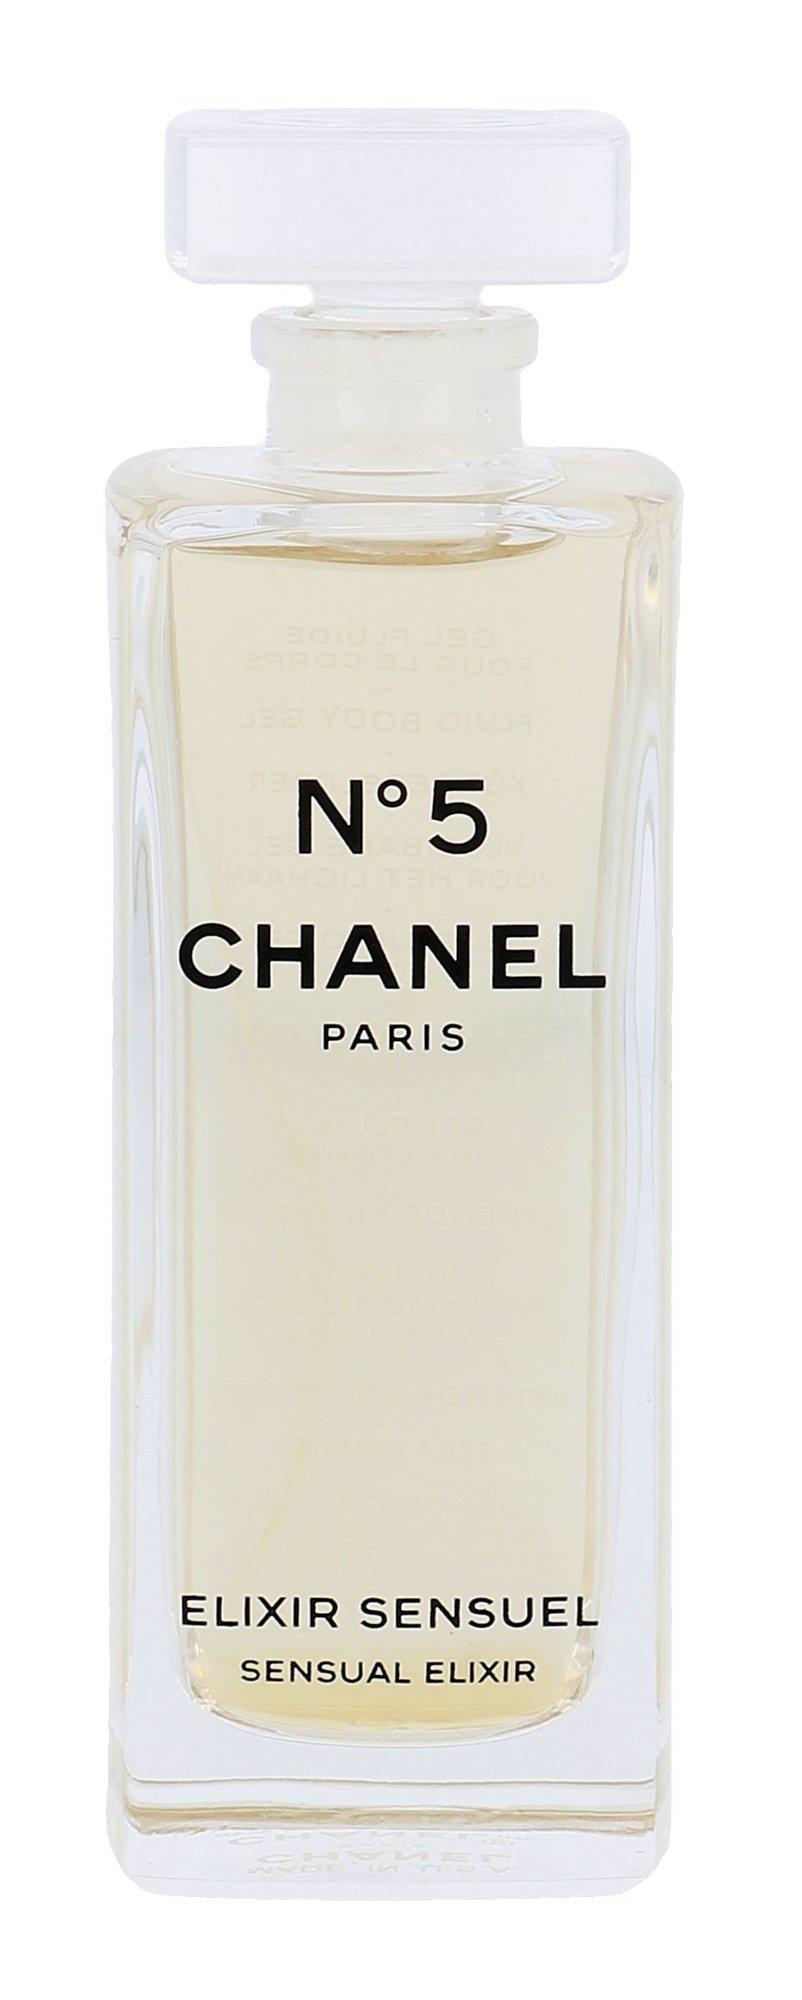 Chanel No.5 Elixir Sensuel Body gel 50ml